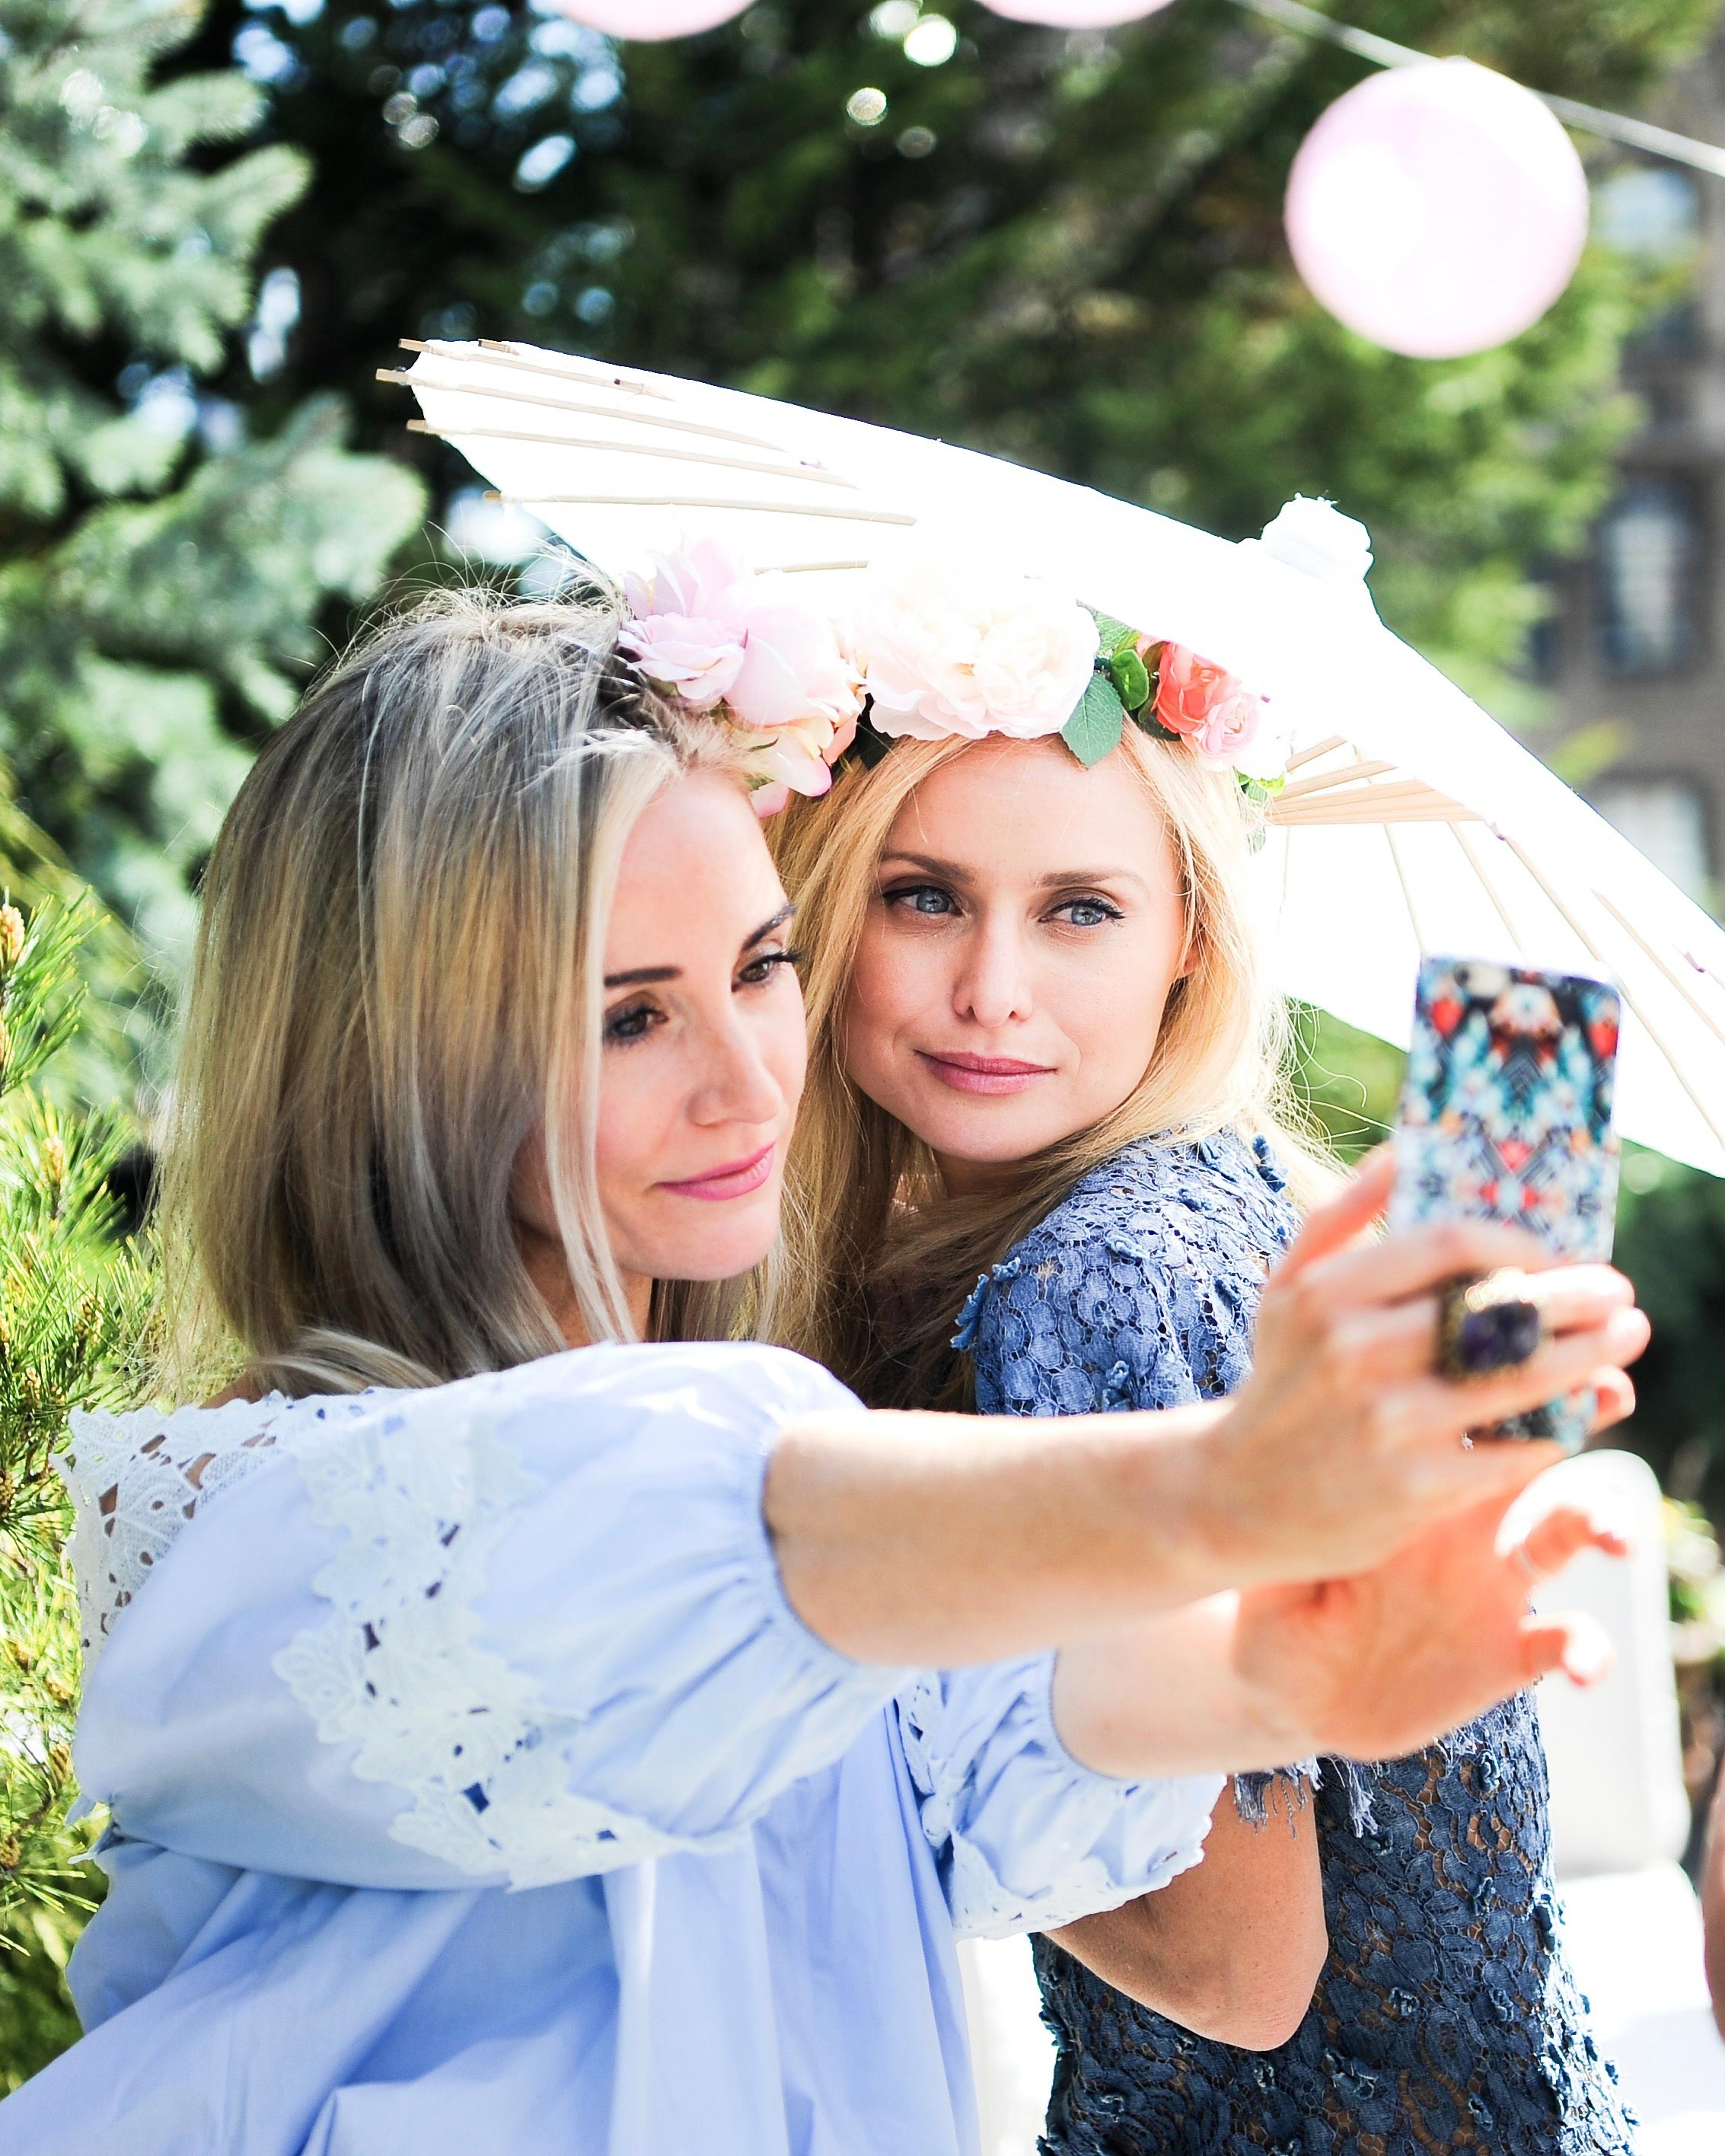 annie-atkinson-bridal-shower-cohost-bridesmaid-selfie-0616.jpg